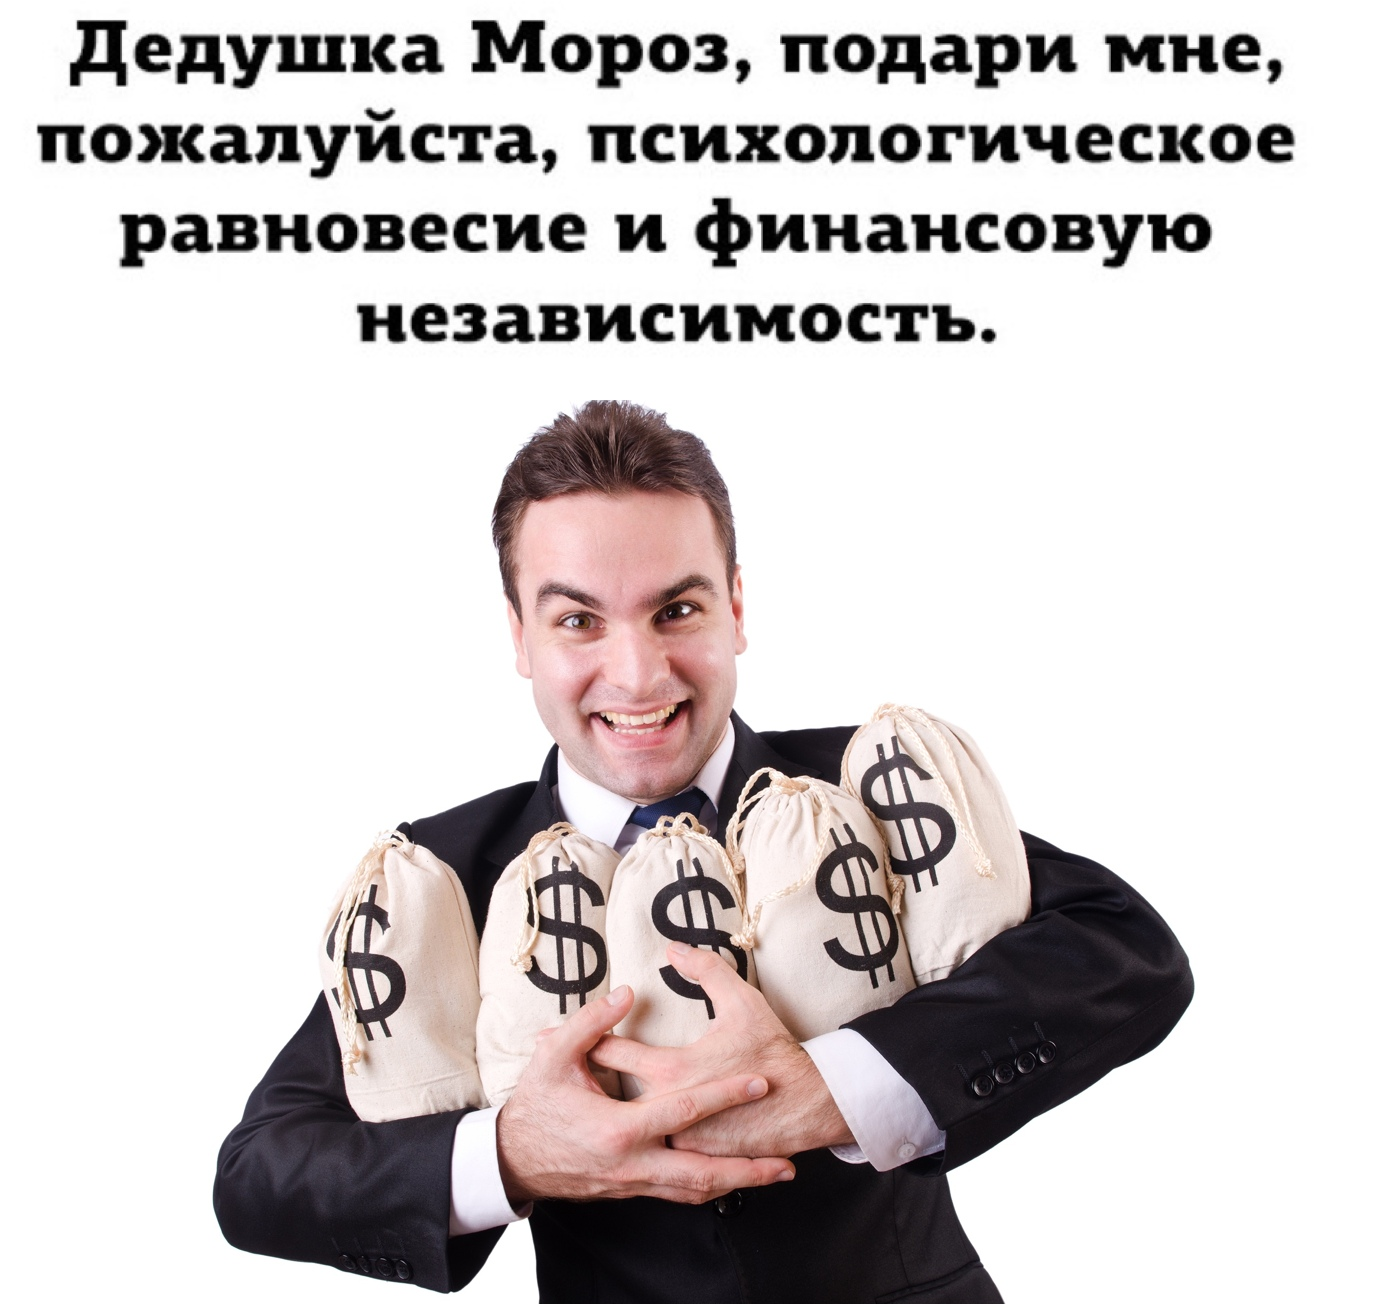 https://pp.userapi.com/c844723/v844723152/1637cc/XpG70wtkKl8.jpg